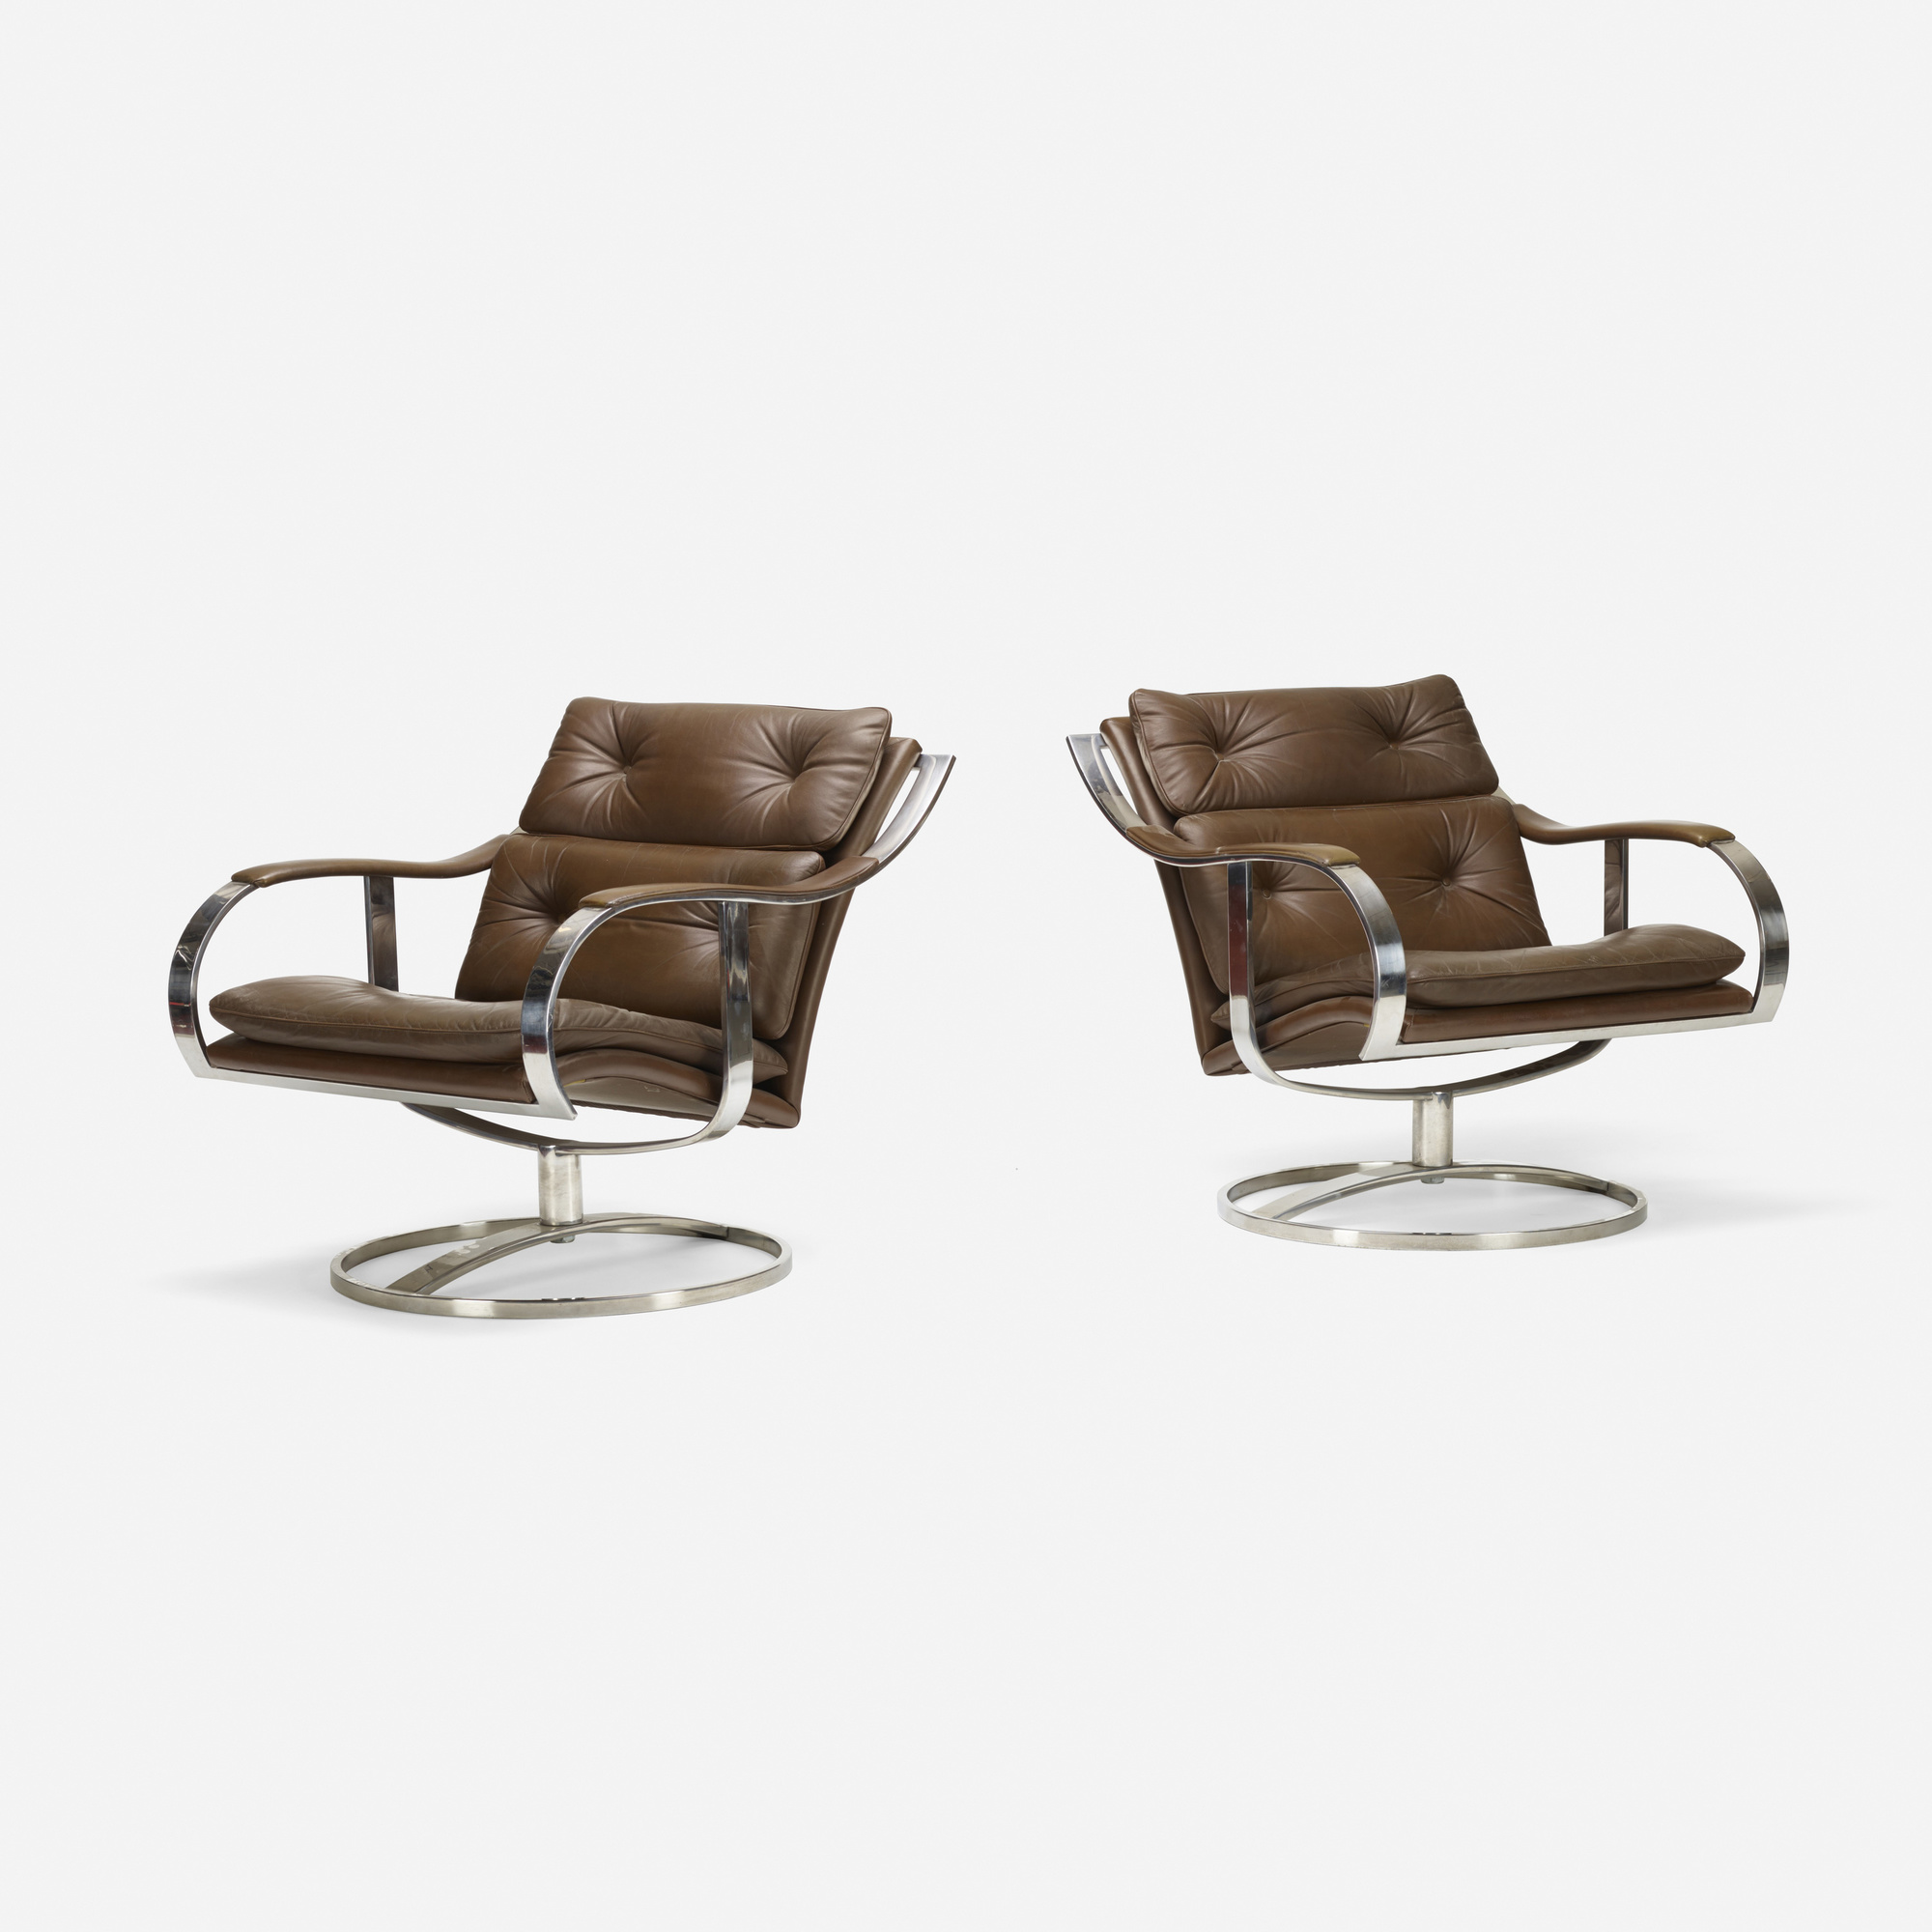 334: Gardner Leaver / lounge chairs, pair (1 of 2)